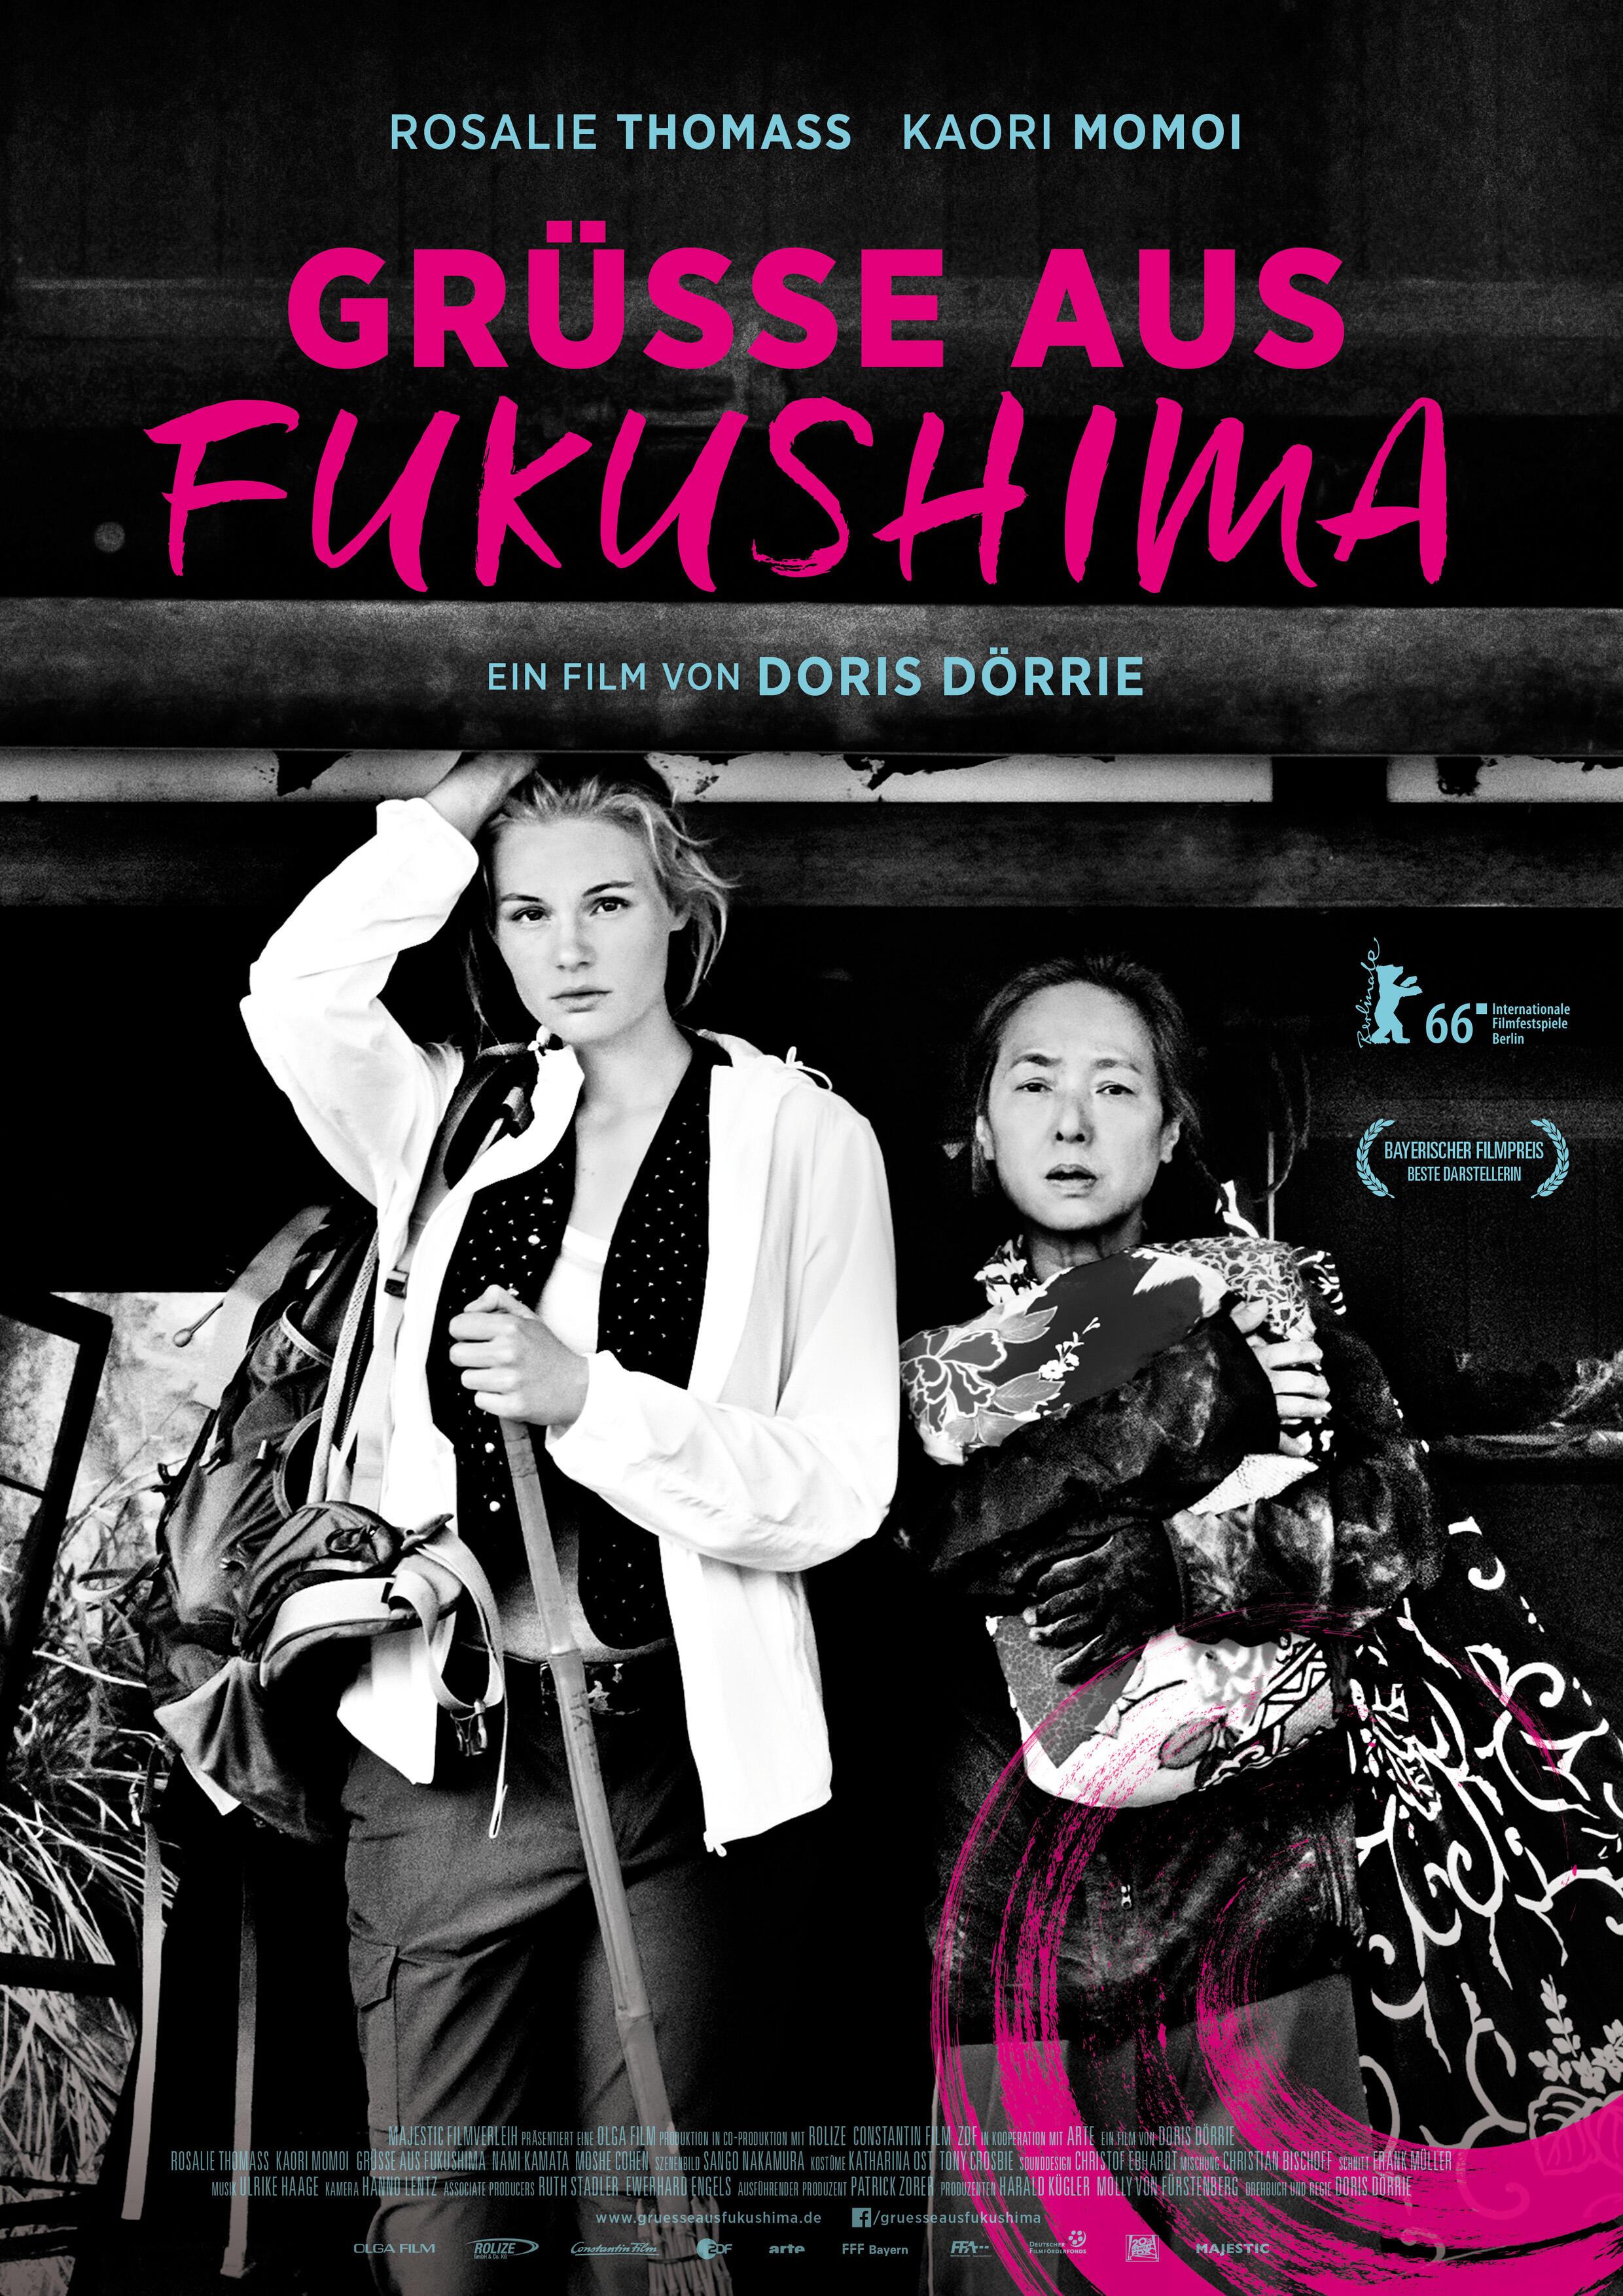 http://assets.cdn.moviepilot.de/files/4efed58698fc1a3c697d183fef1018a6a71eeea97185fc252a4d1c091fc6/Gruesse-Aus-Fukushima-poster.jpg